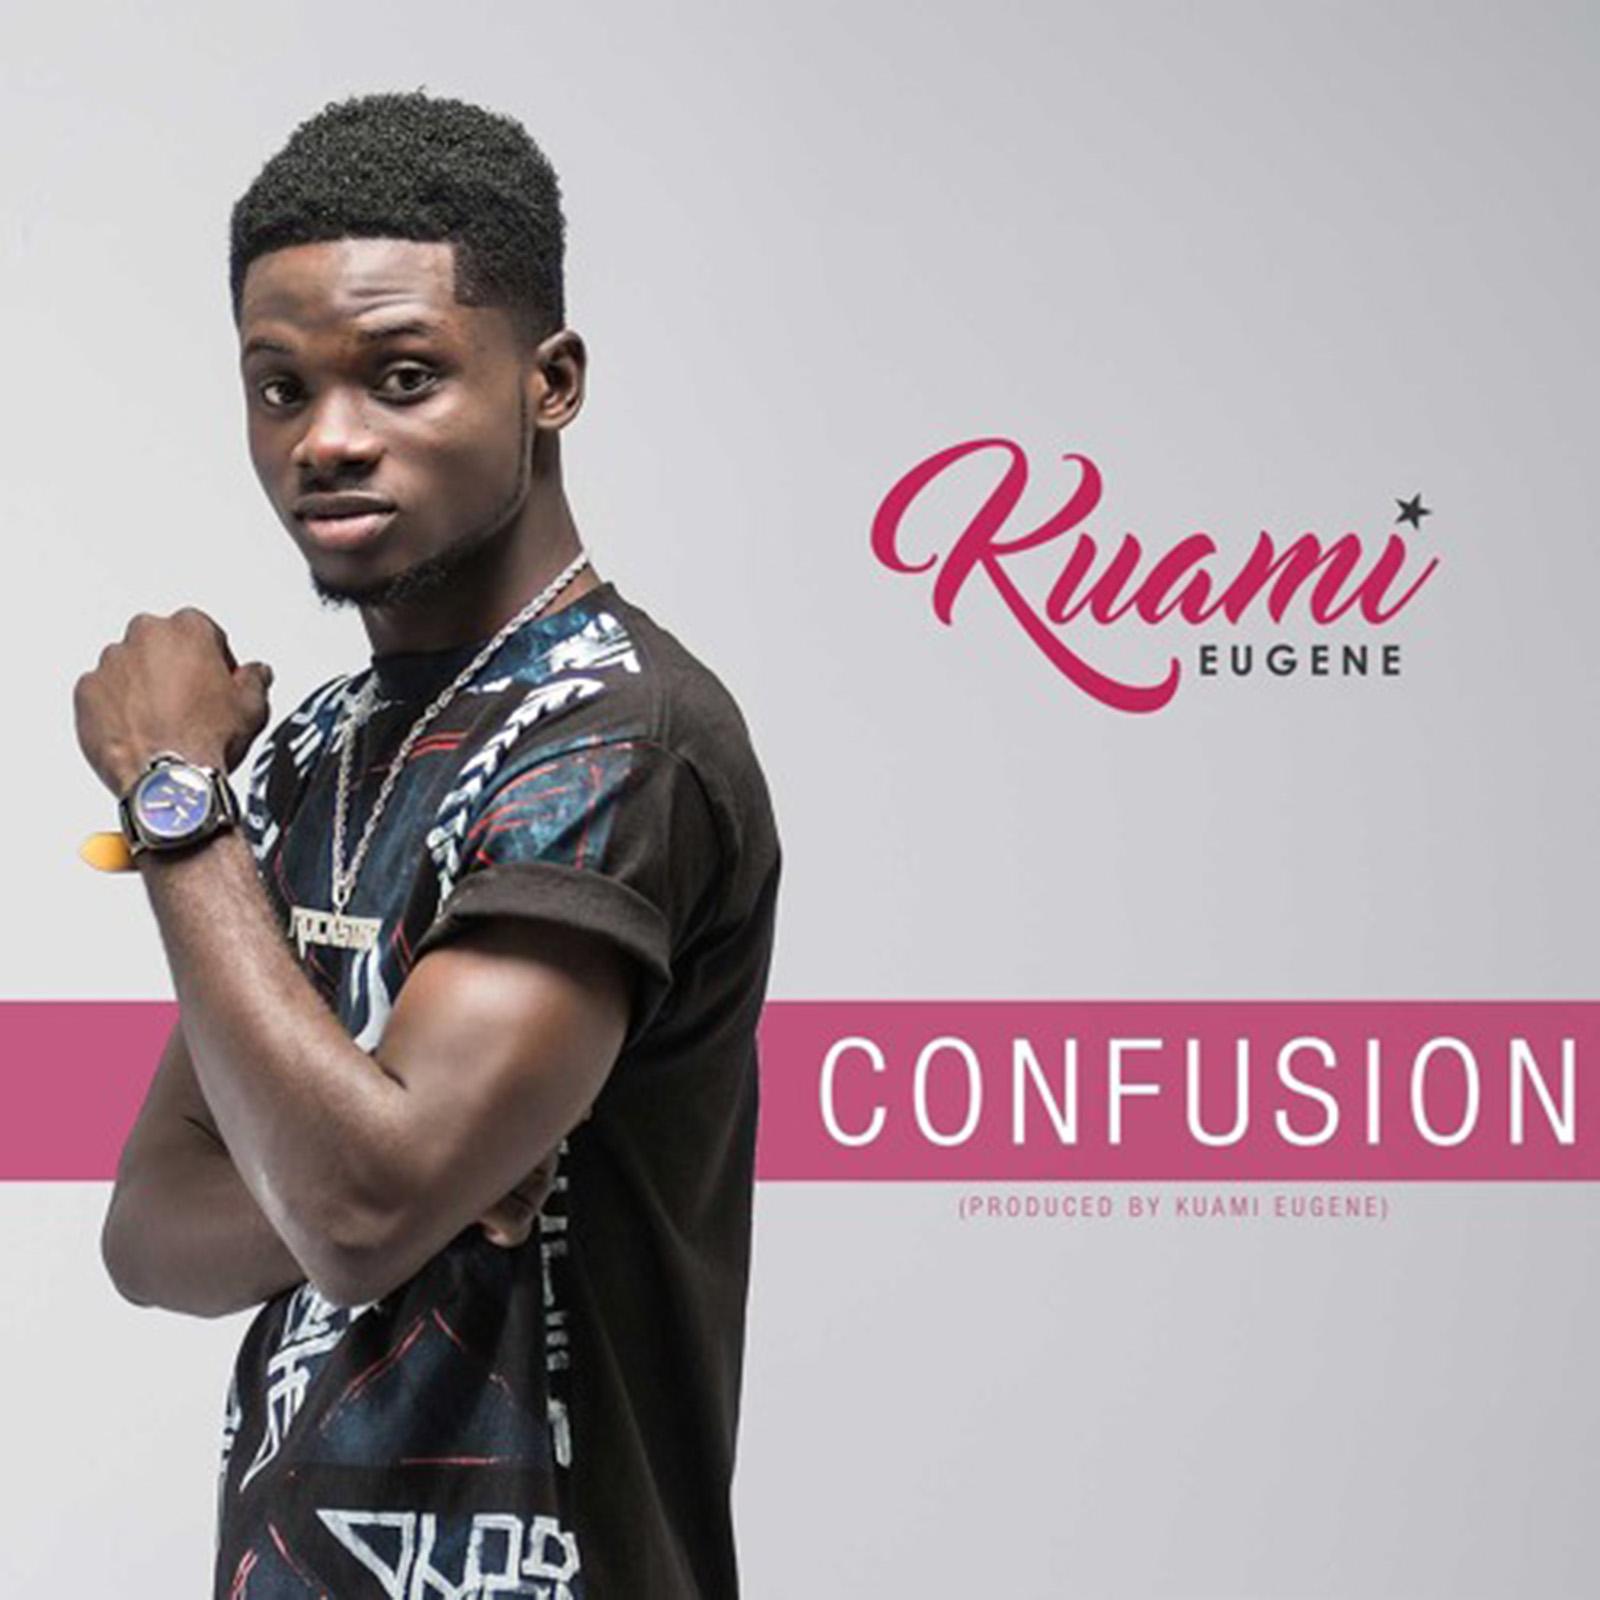 Confusion by Kuami Eugene